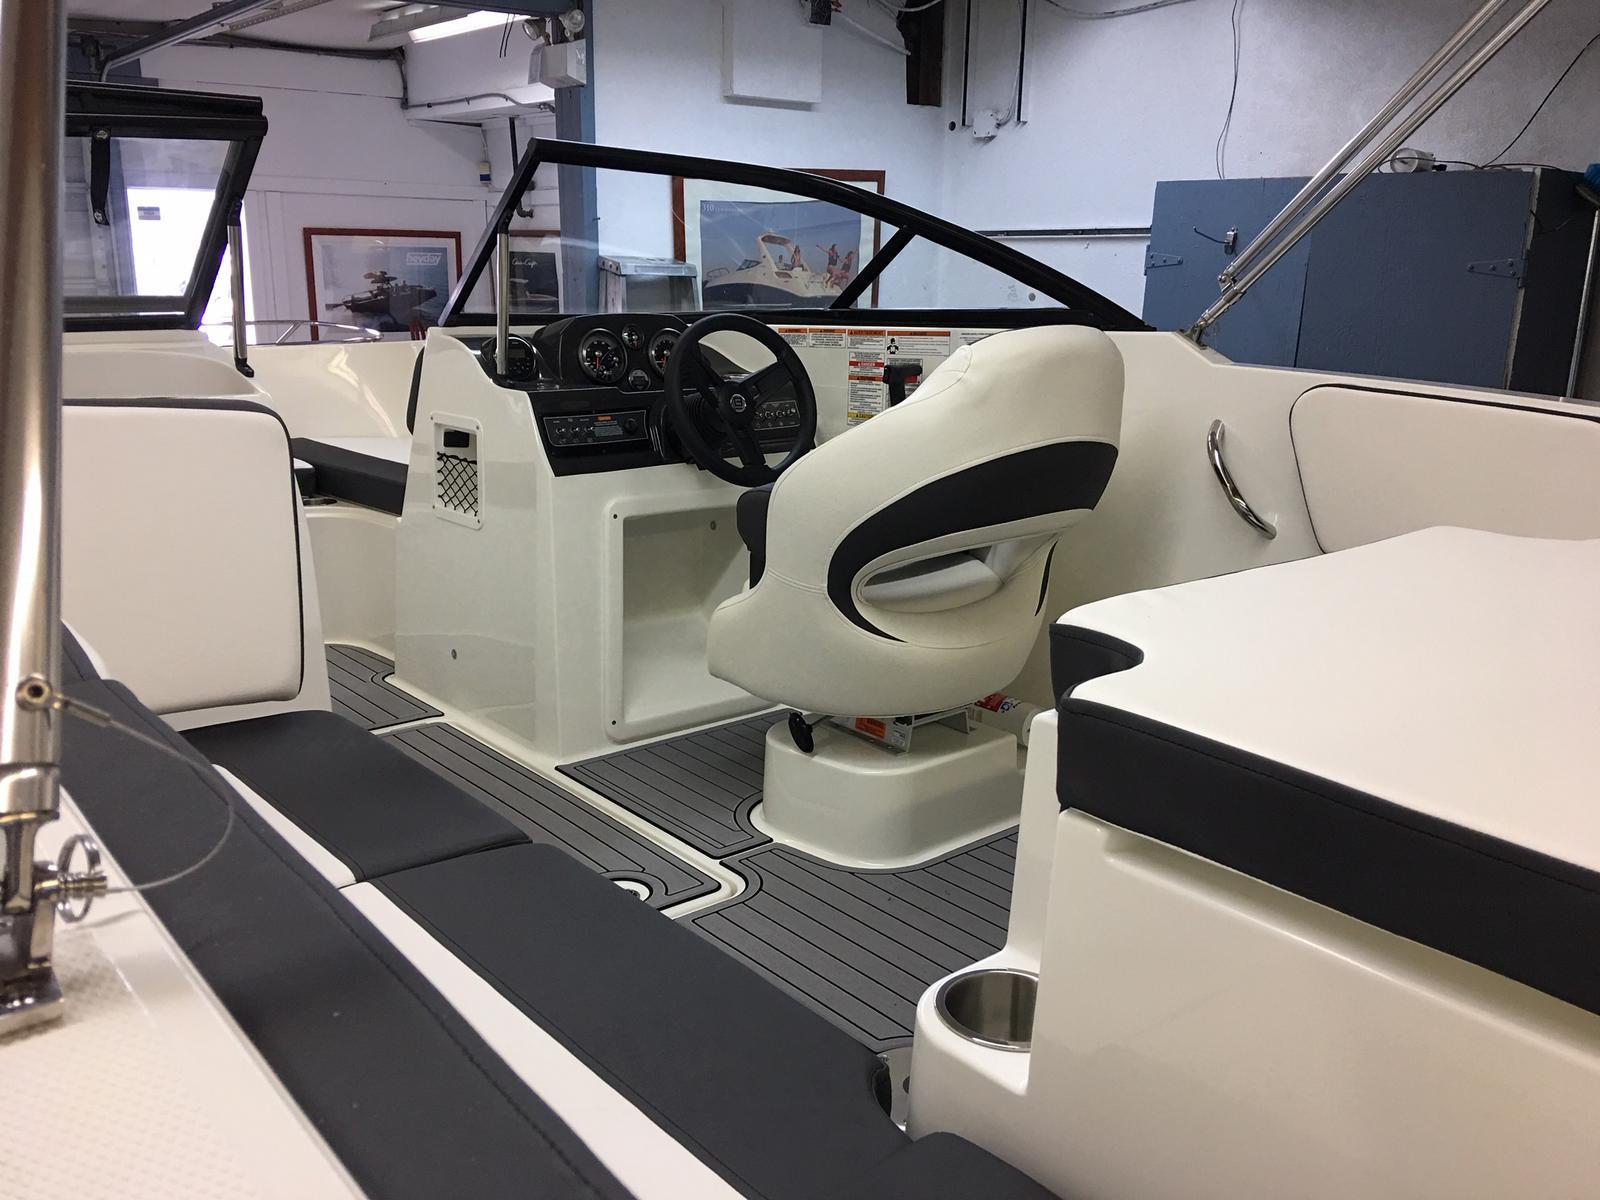 2019 Bayliner boat for sale, model of the boat is VR4 Bowrider & Image # 2 of 21